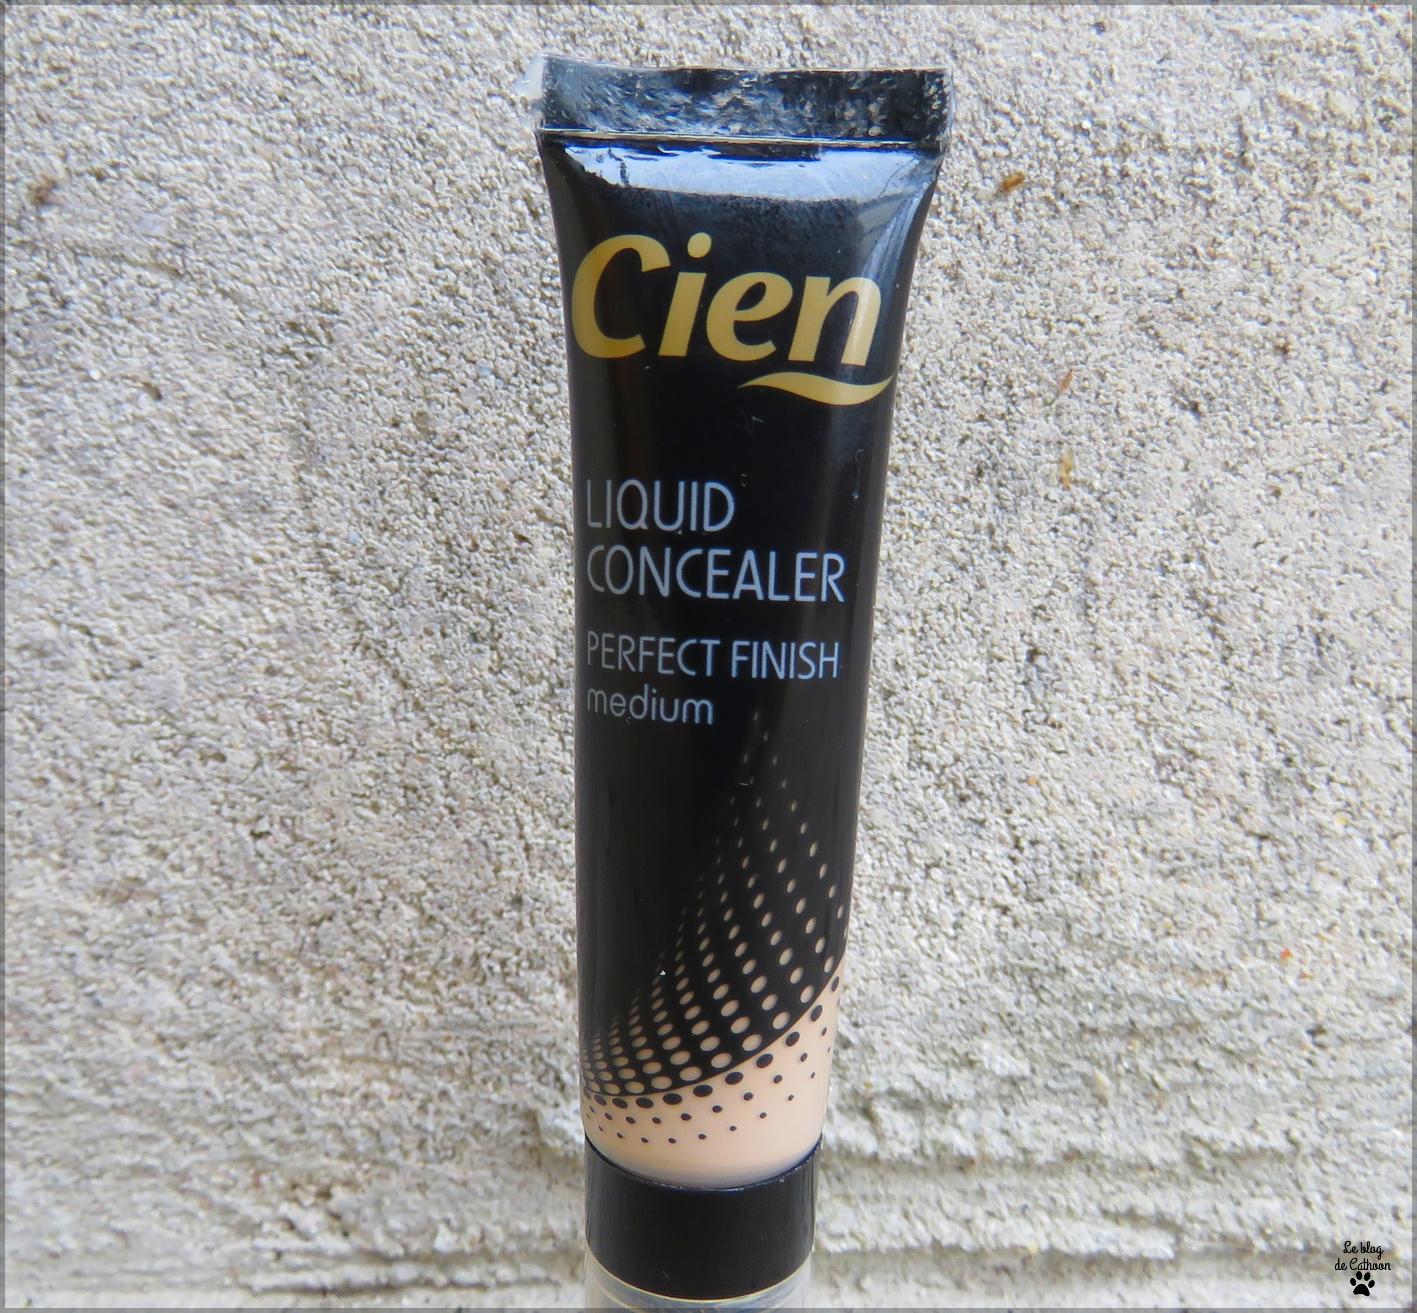 Liquid Concealer - Cien - Lidl